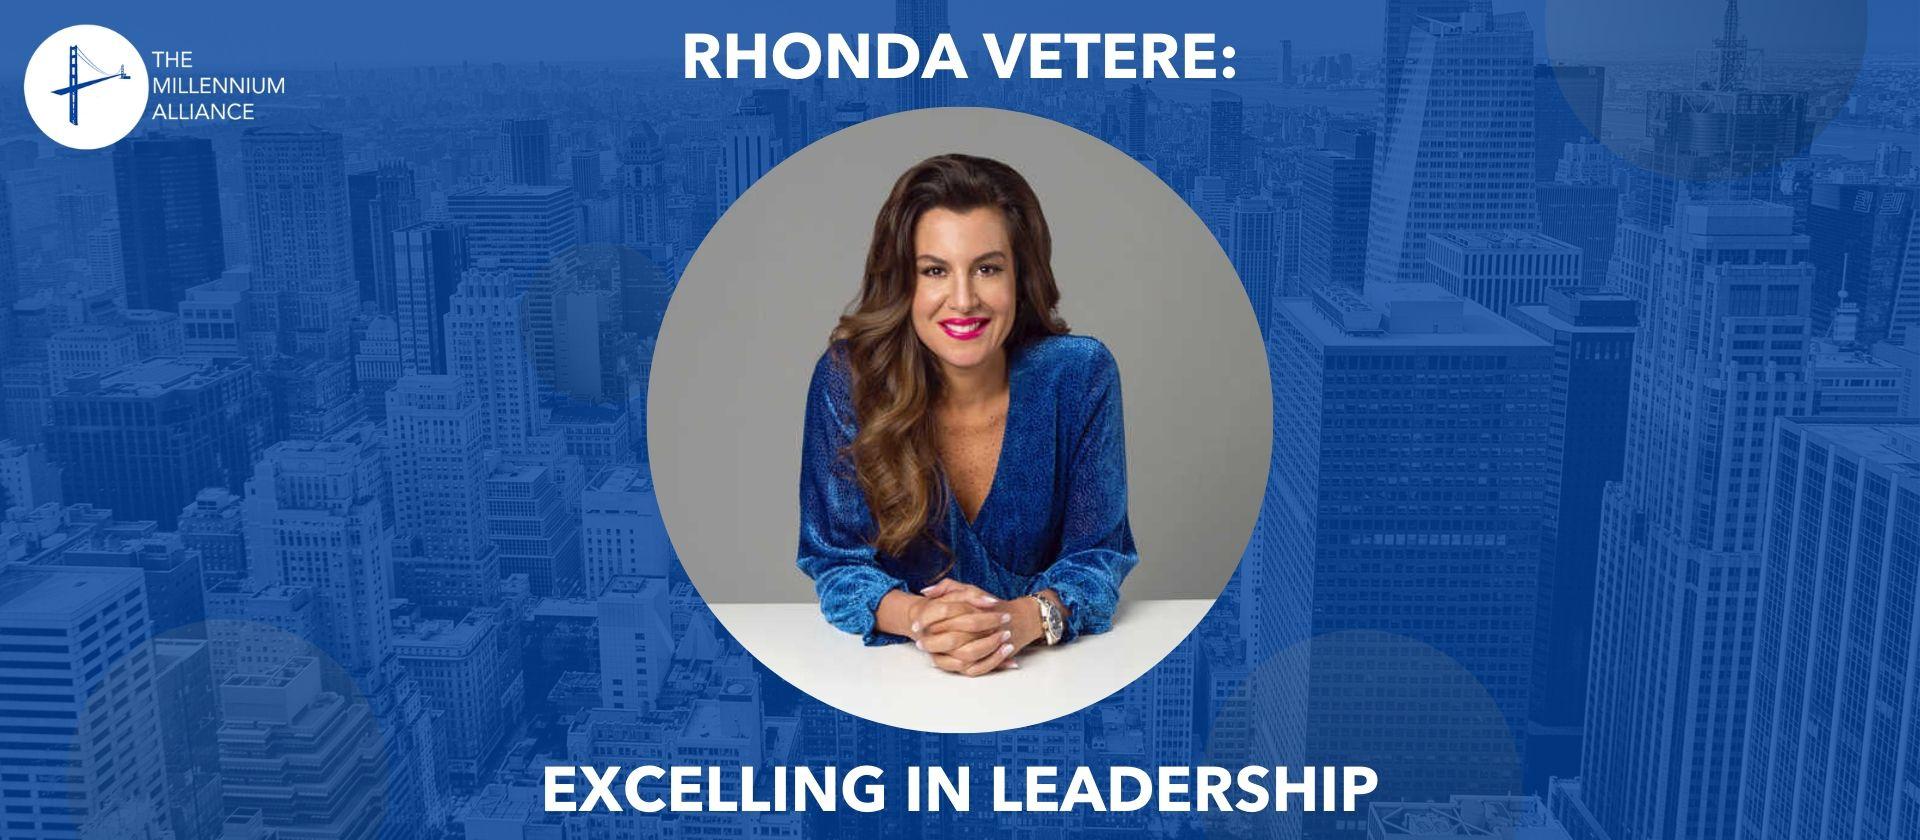 rhonda vetere leadership millennium alliance